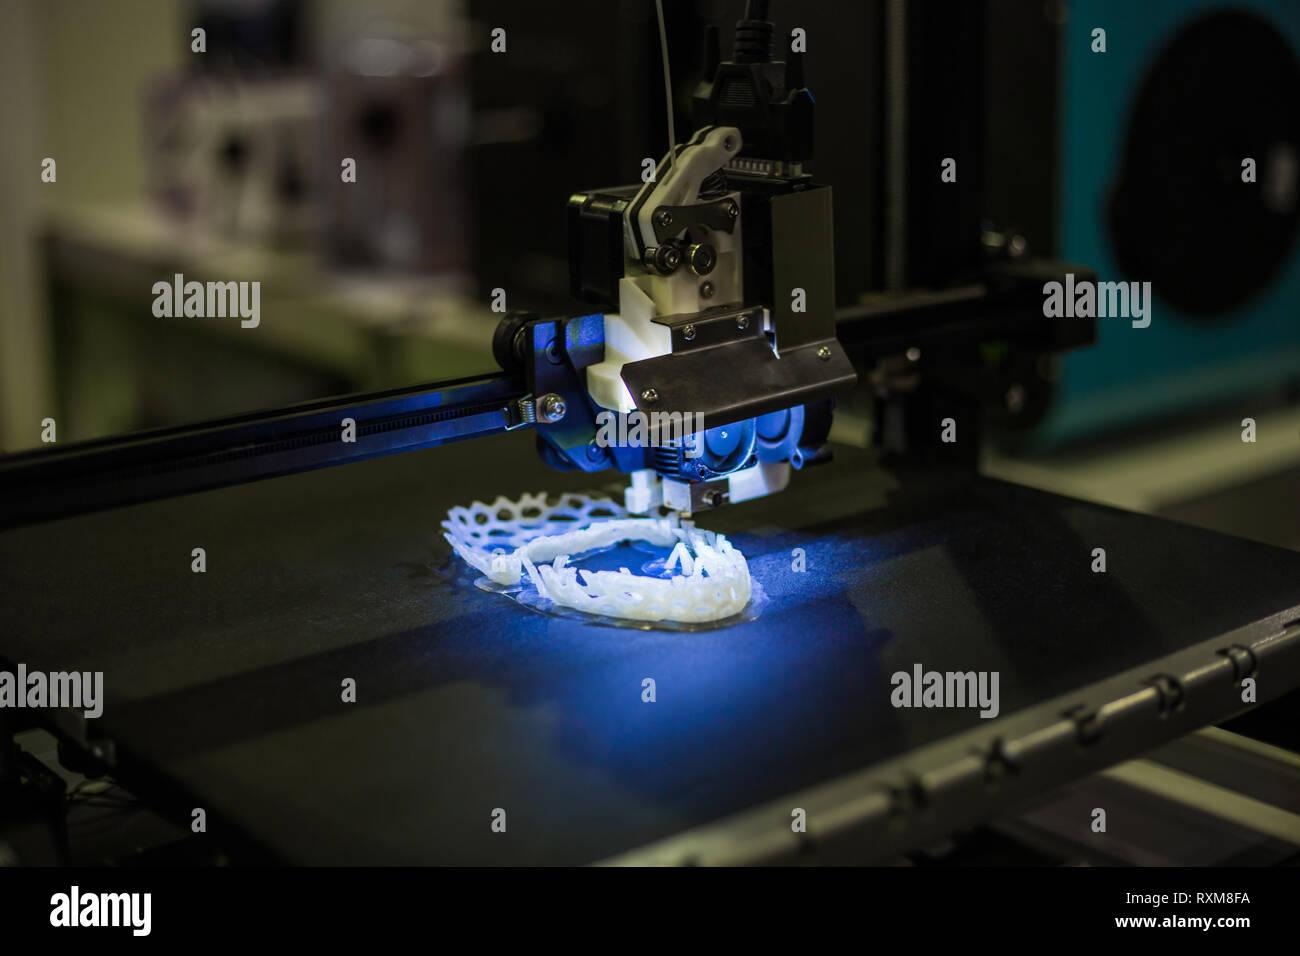 Automatic three dimensional 3D printer machine printing plastic model - Stock Image